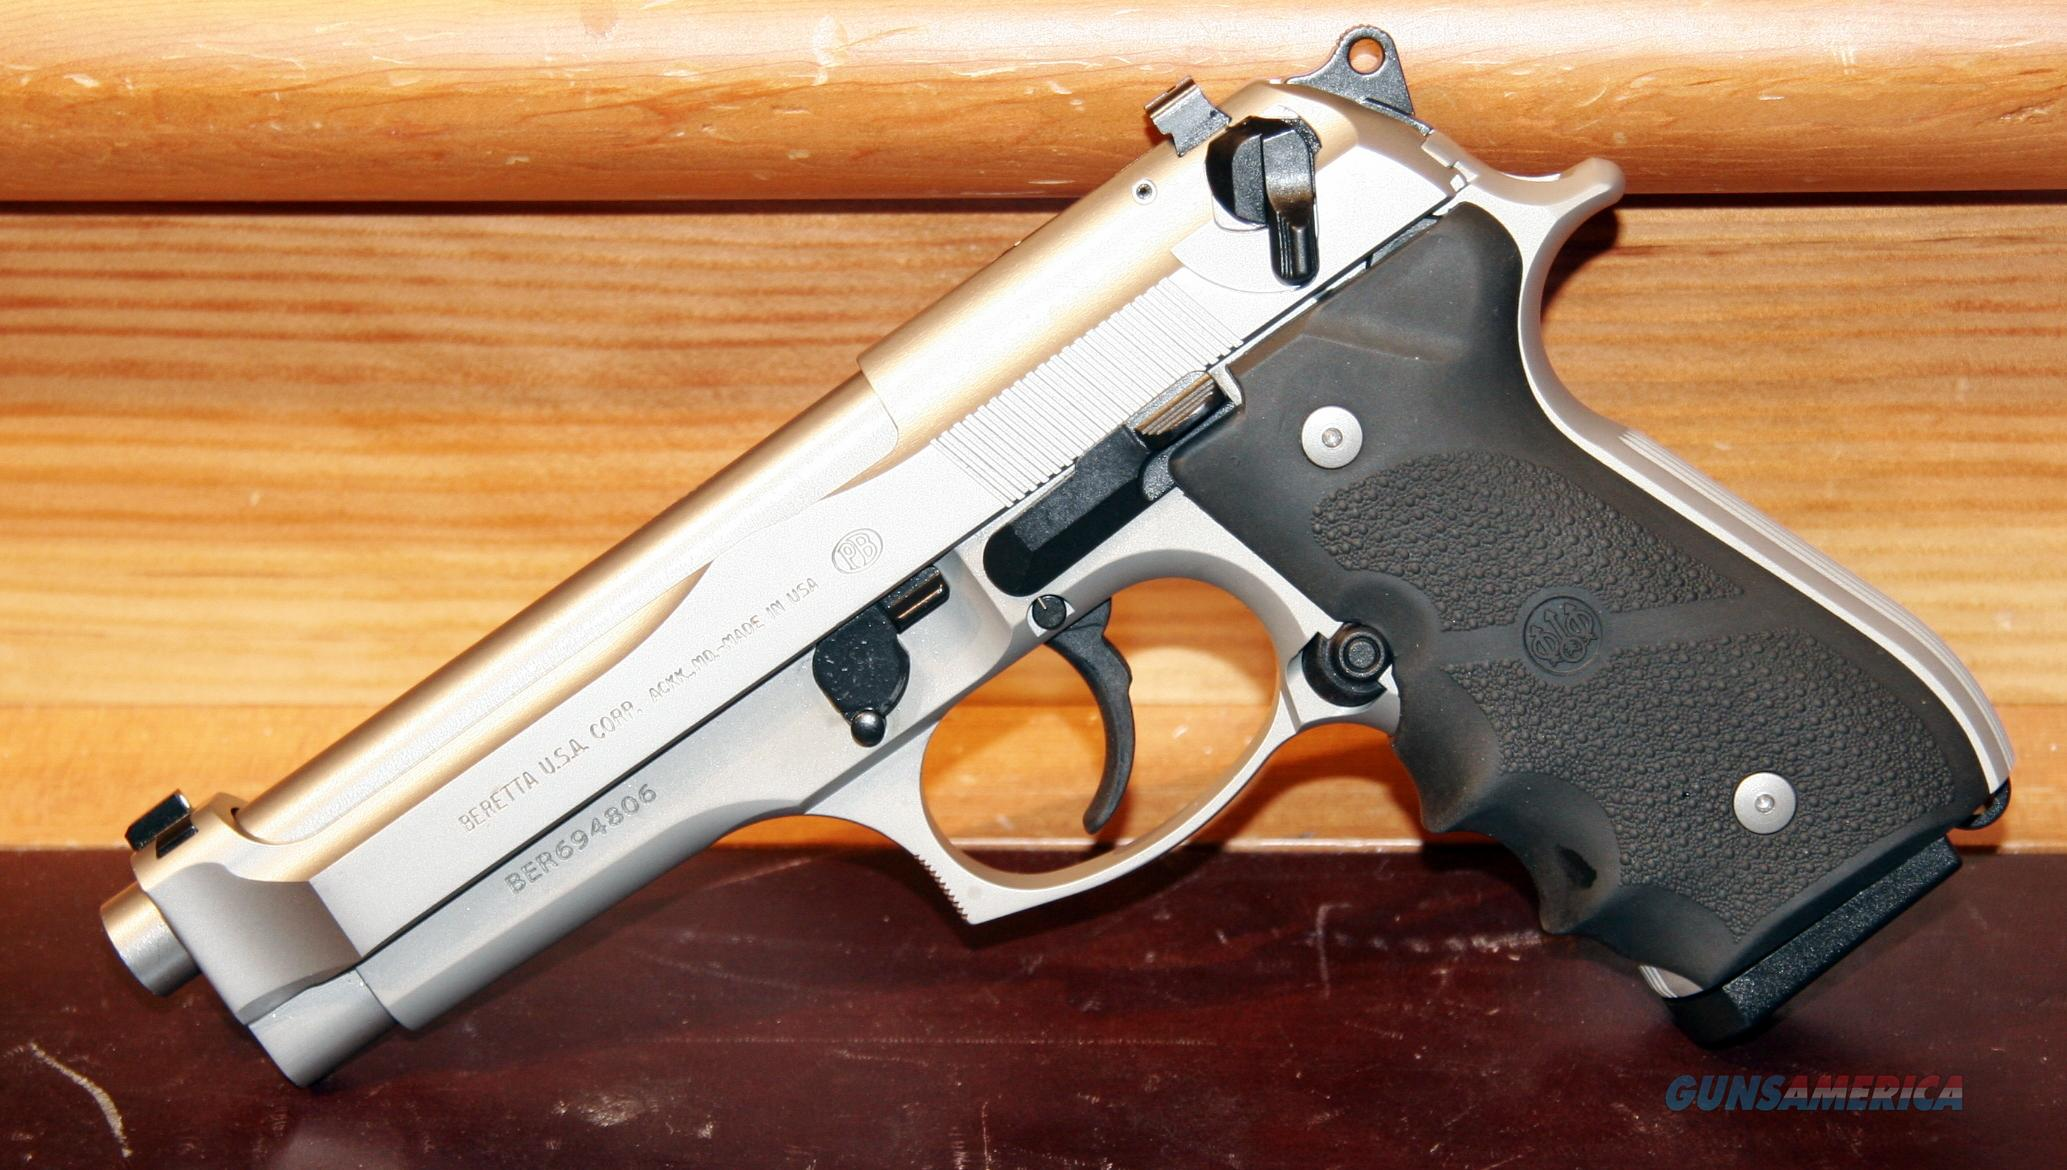 - Beretta 92 Brigadier INOX 9mm - CA OK!